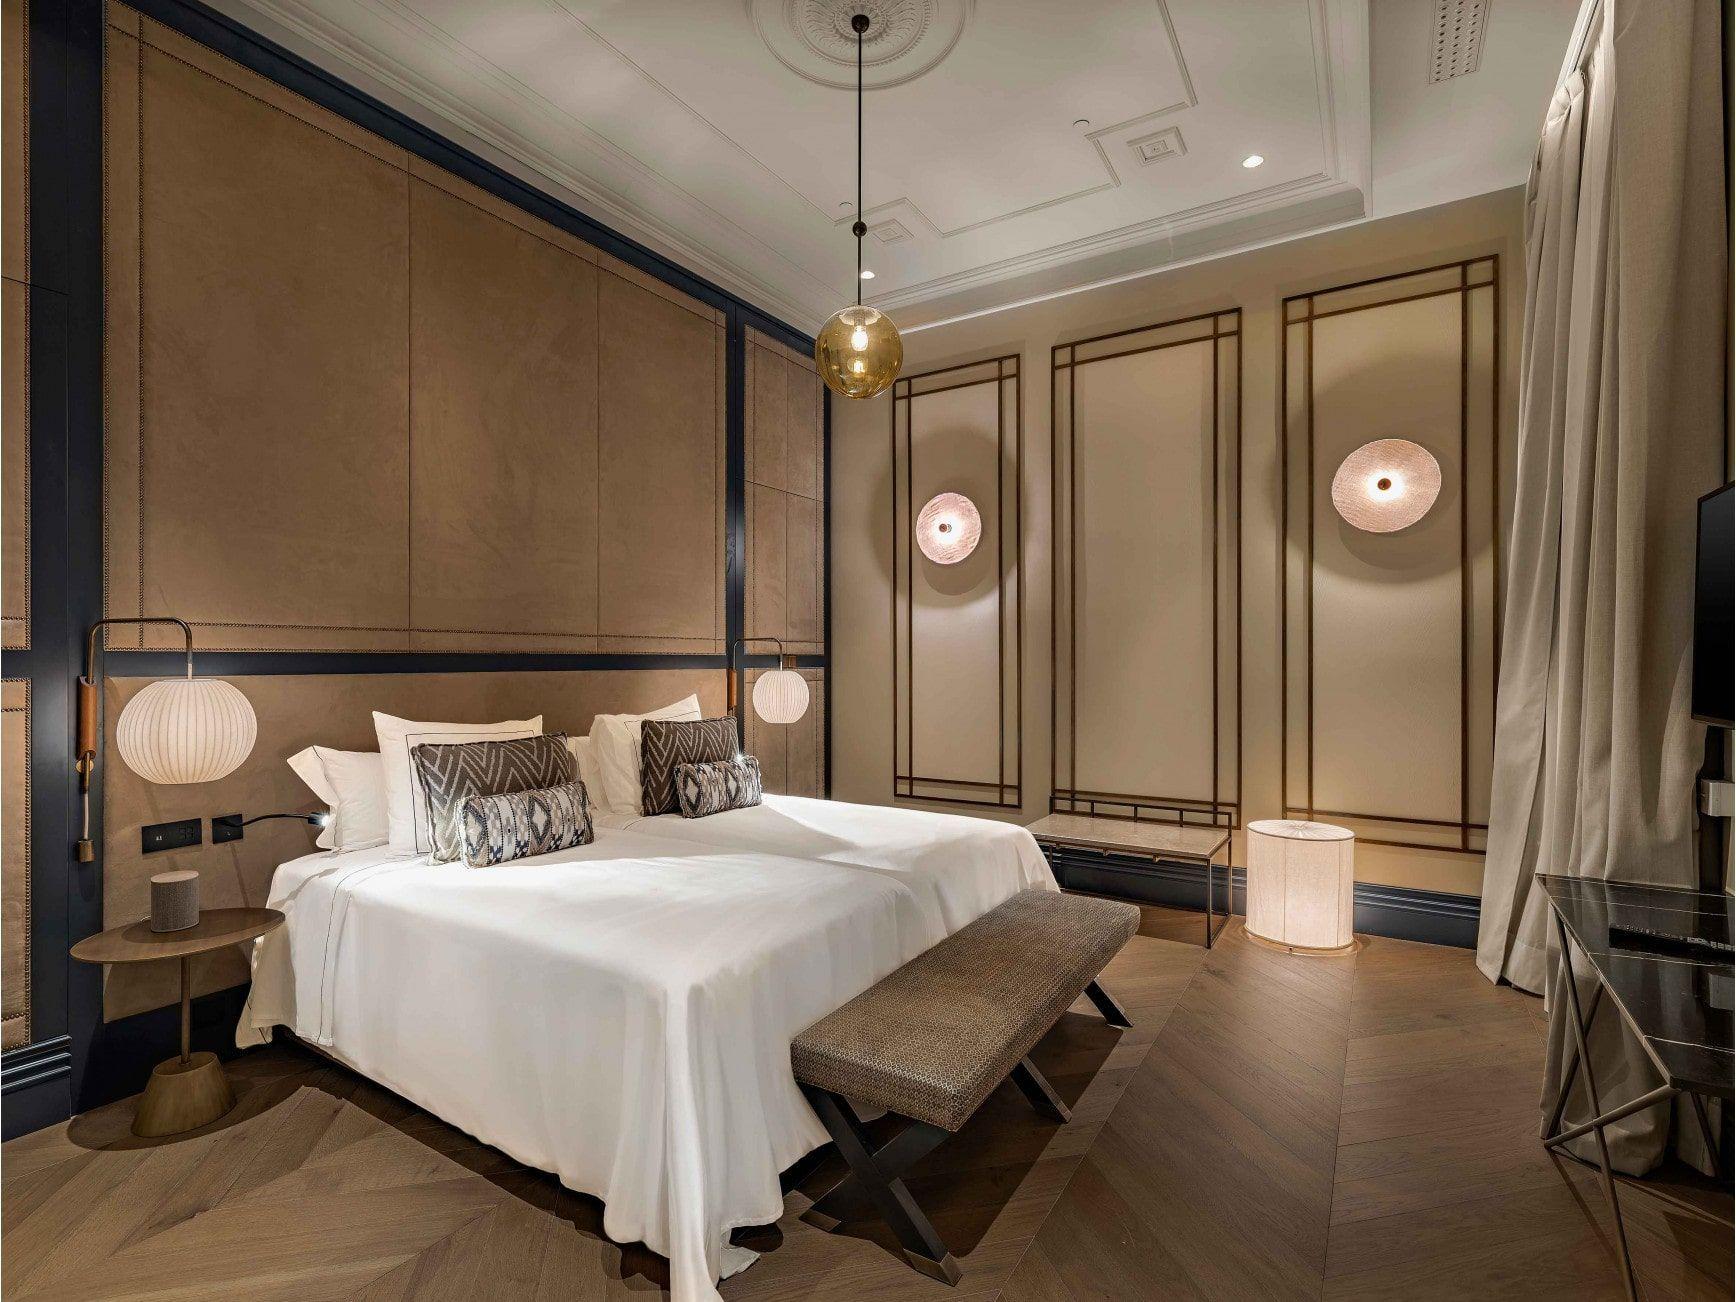 COOLROOMS Madrid_ hoteles en madrid_ hoteles nuevos en Madrid